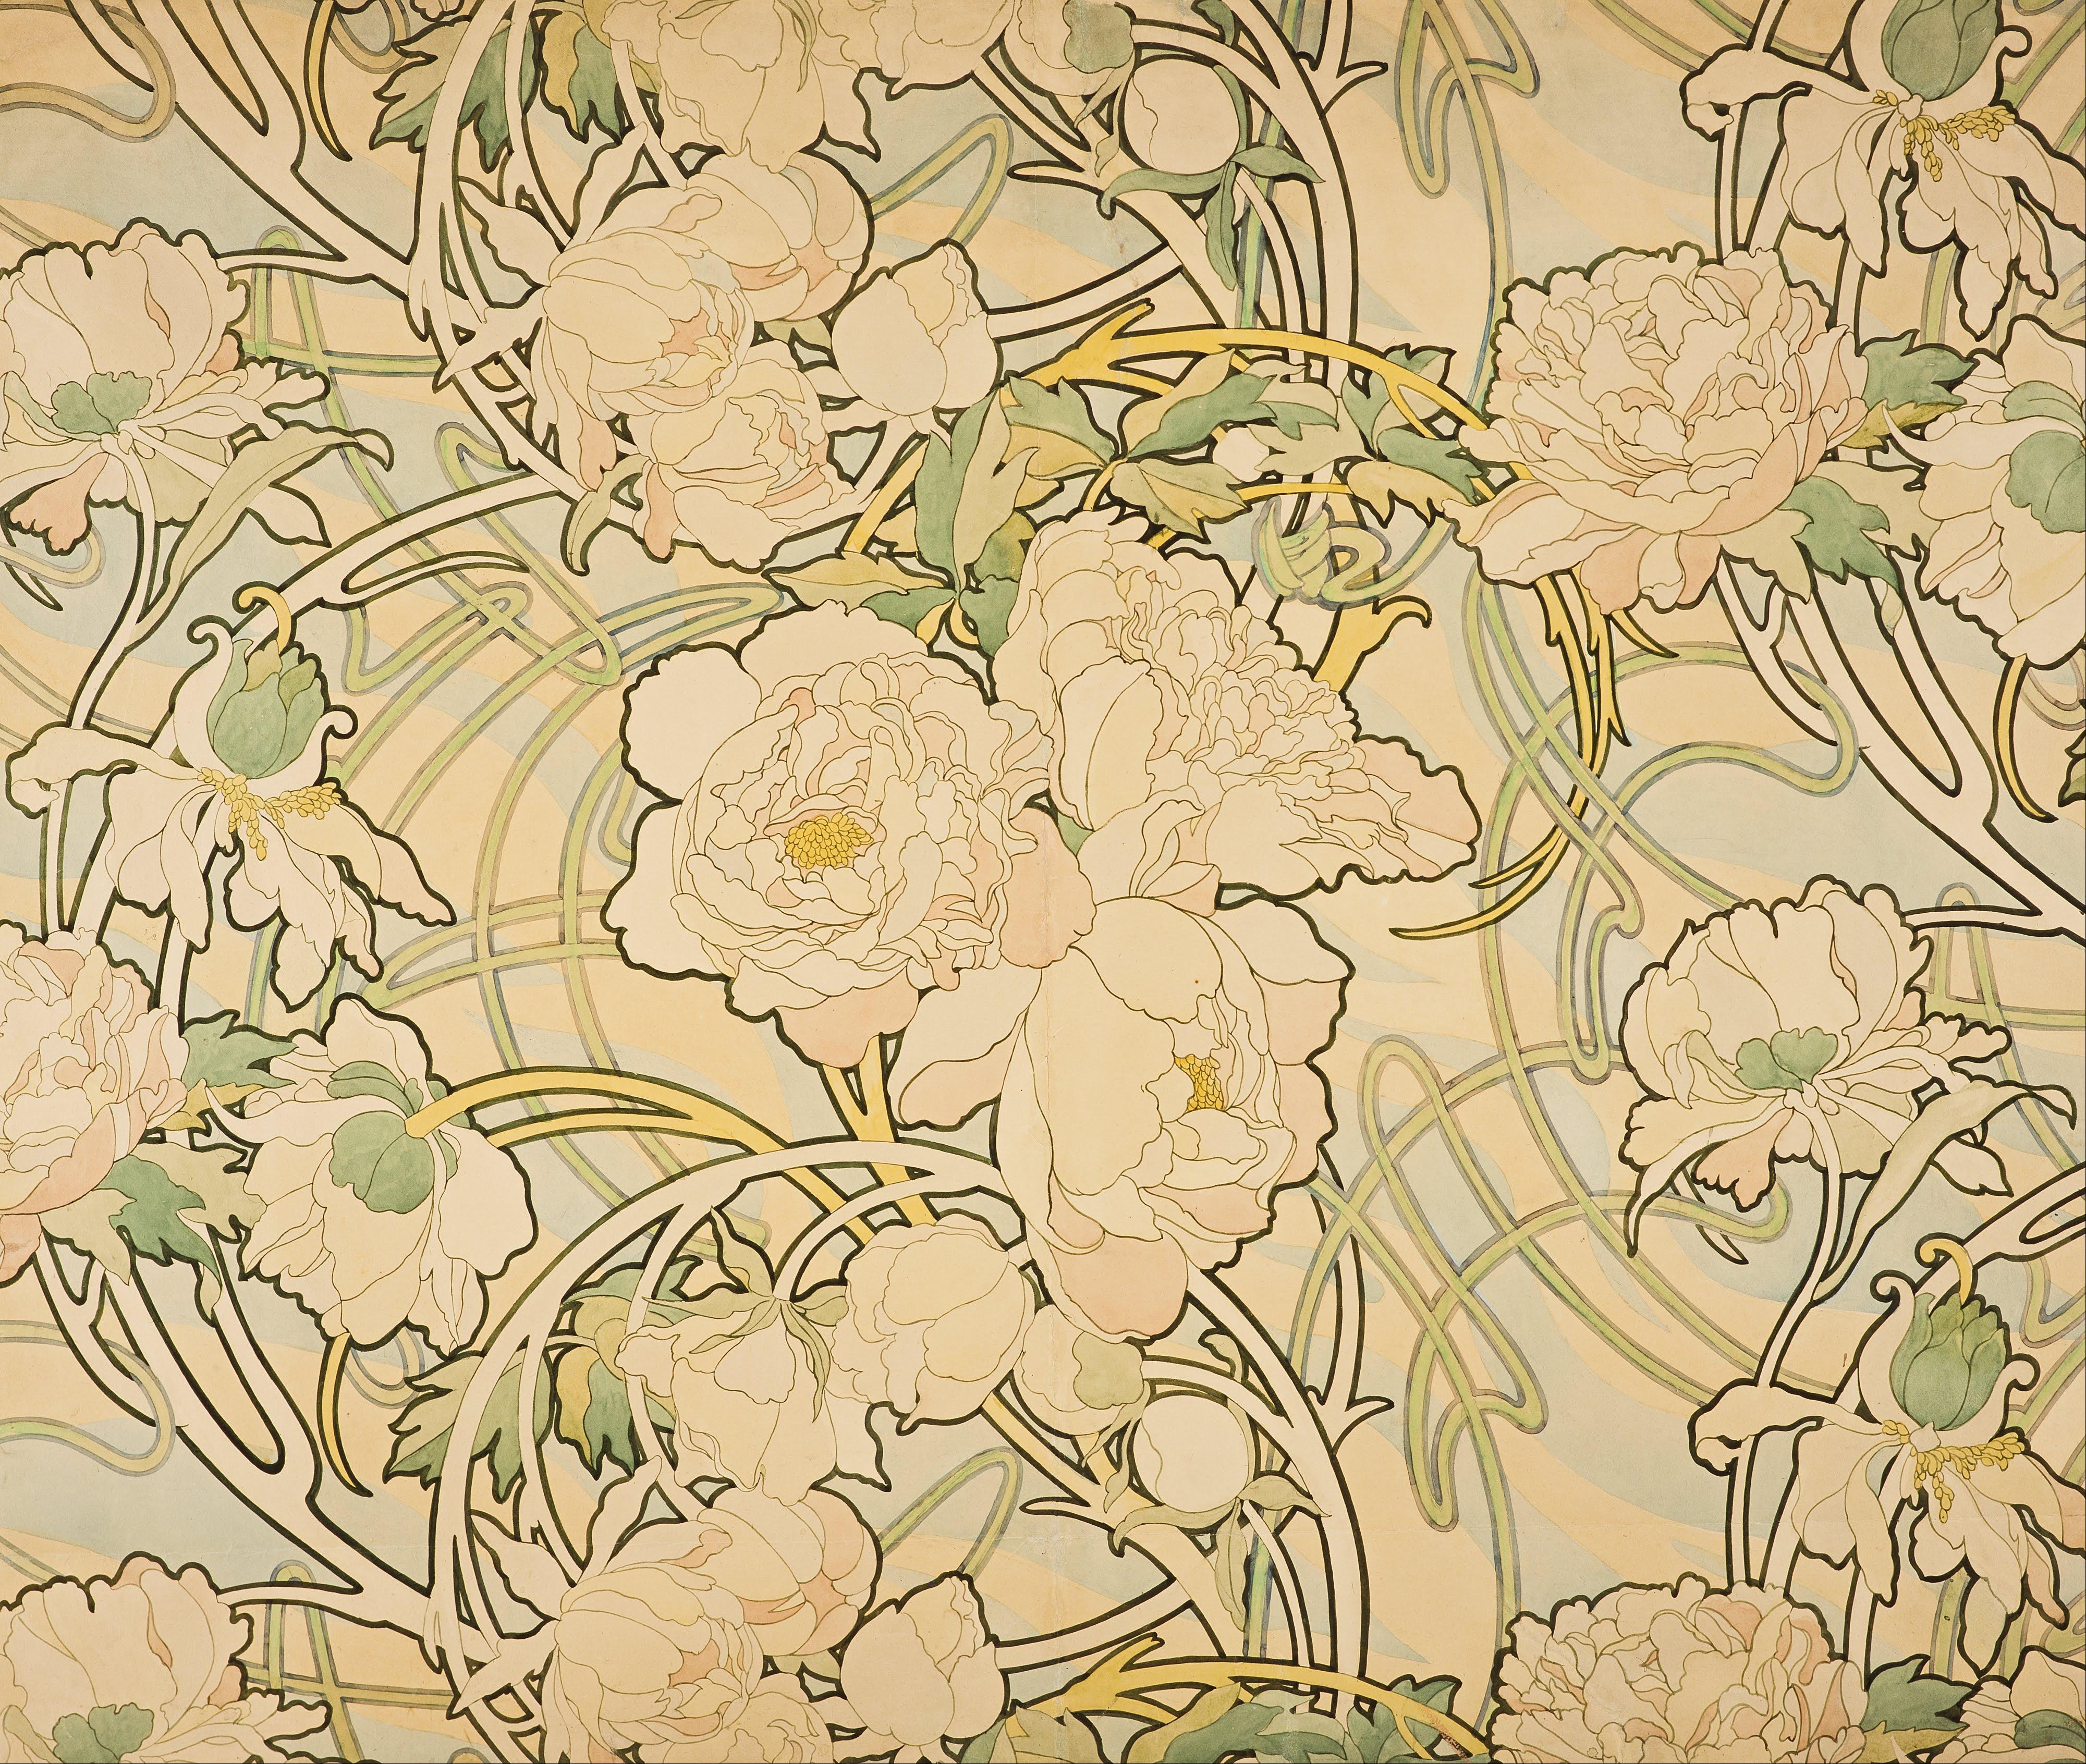 File:Alphonse Mucha - Peonies - Google Art Project.jpg